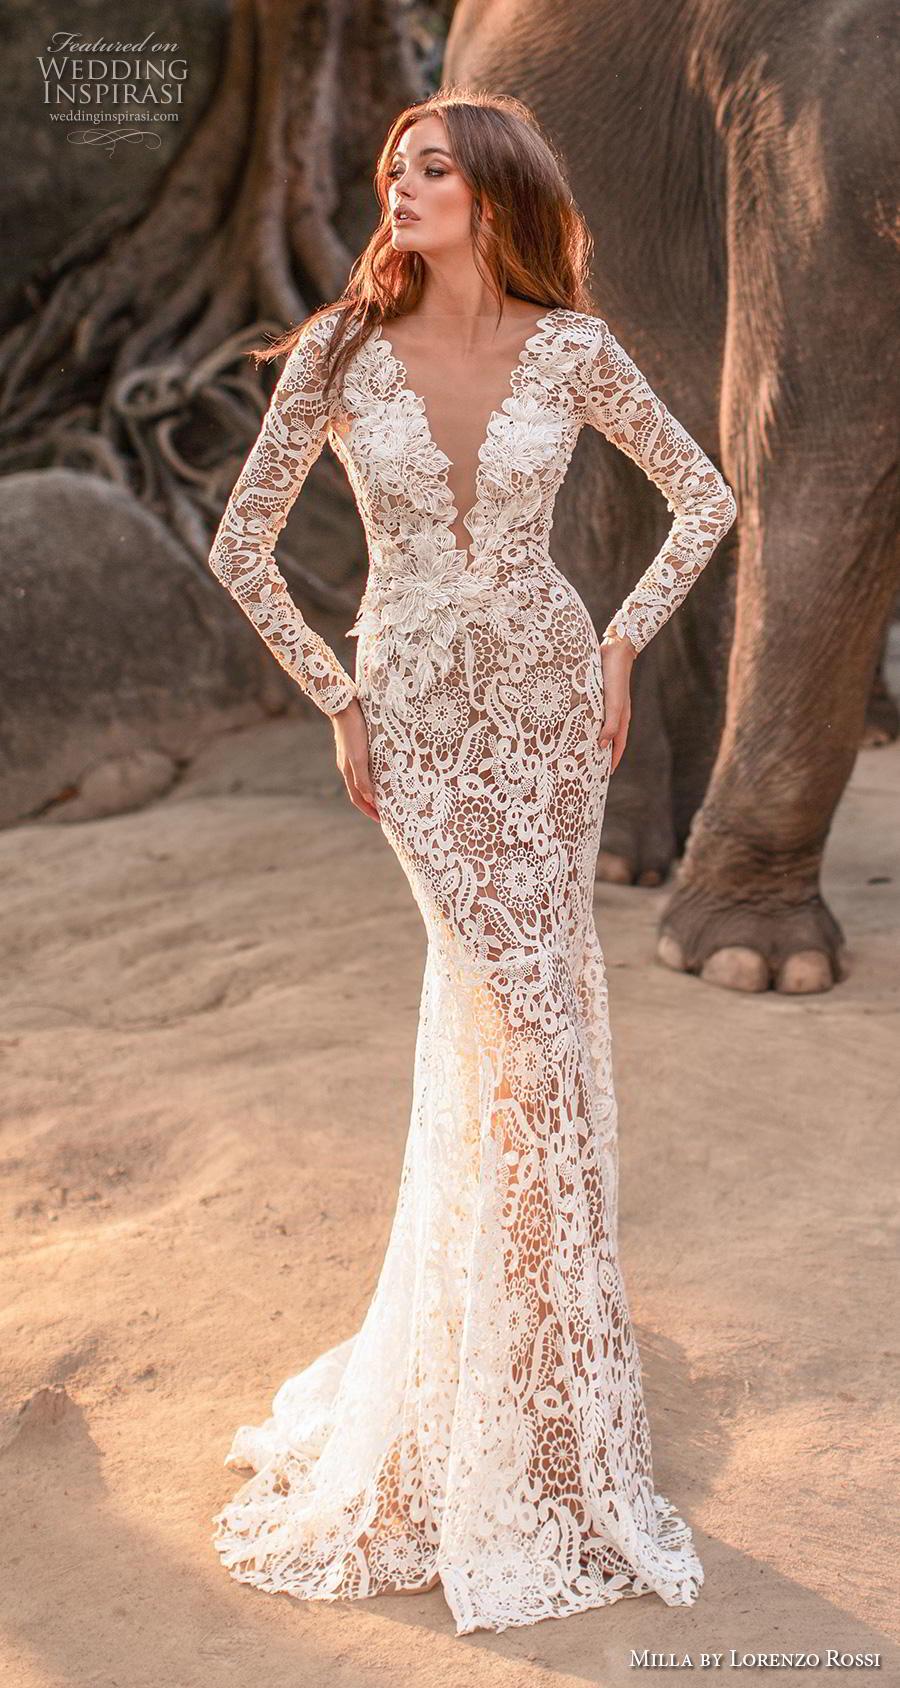 lorenzo rossi 2019 milla bridal long sleeves deep v neck full embellishment elegant sheath wedding dress low v back sweep train (17) mv